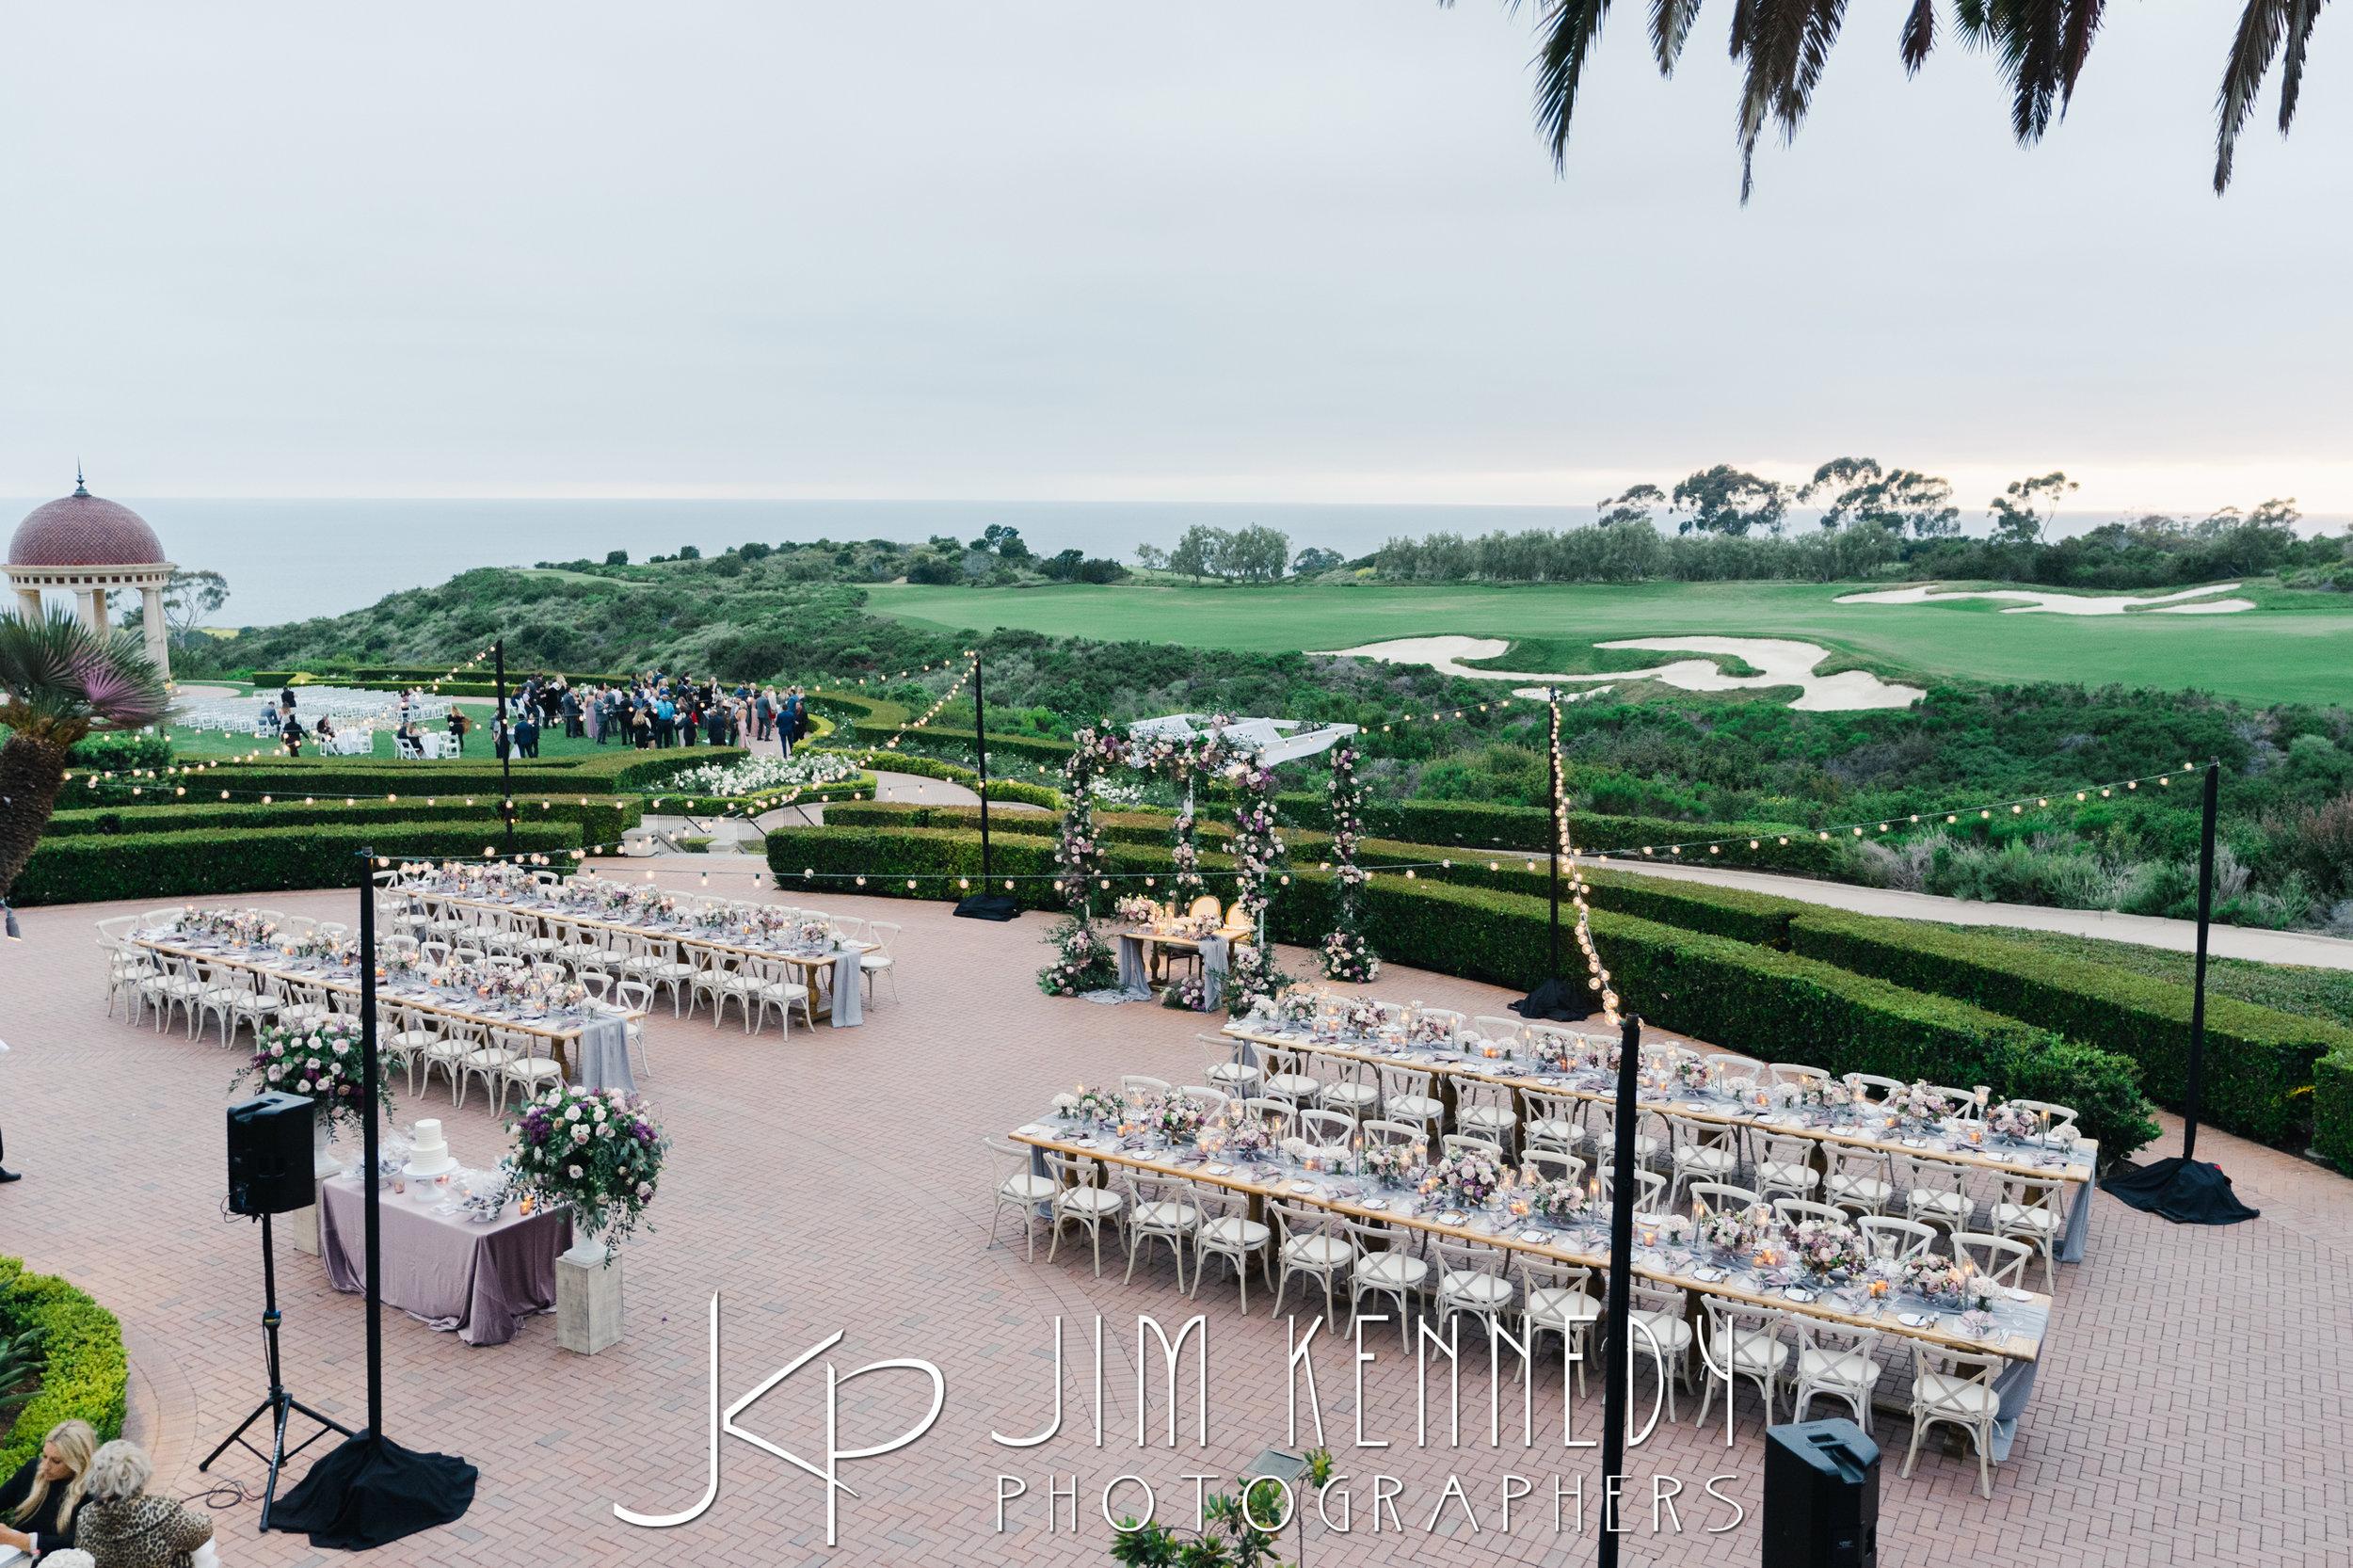 pelican-hill-wedding-jim-kenedy-photographers_0212.JPG